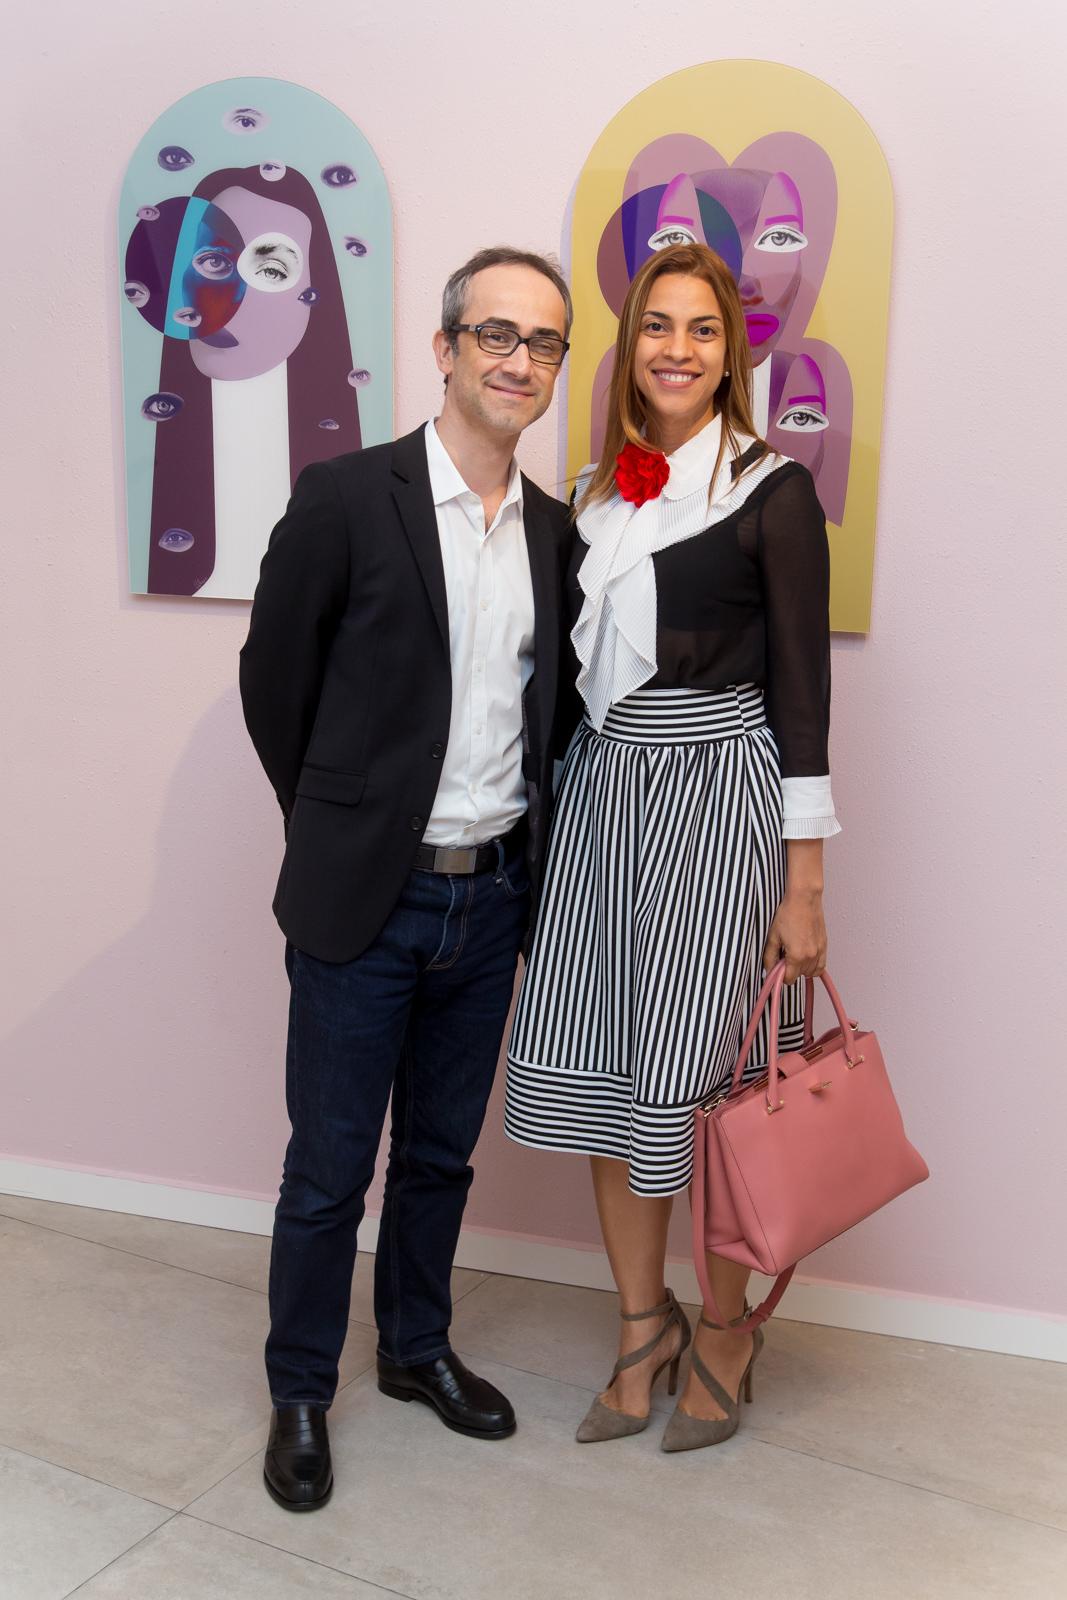 4. Patrick Landry & Rosanna Matos